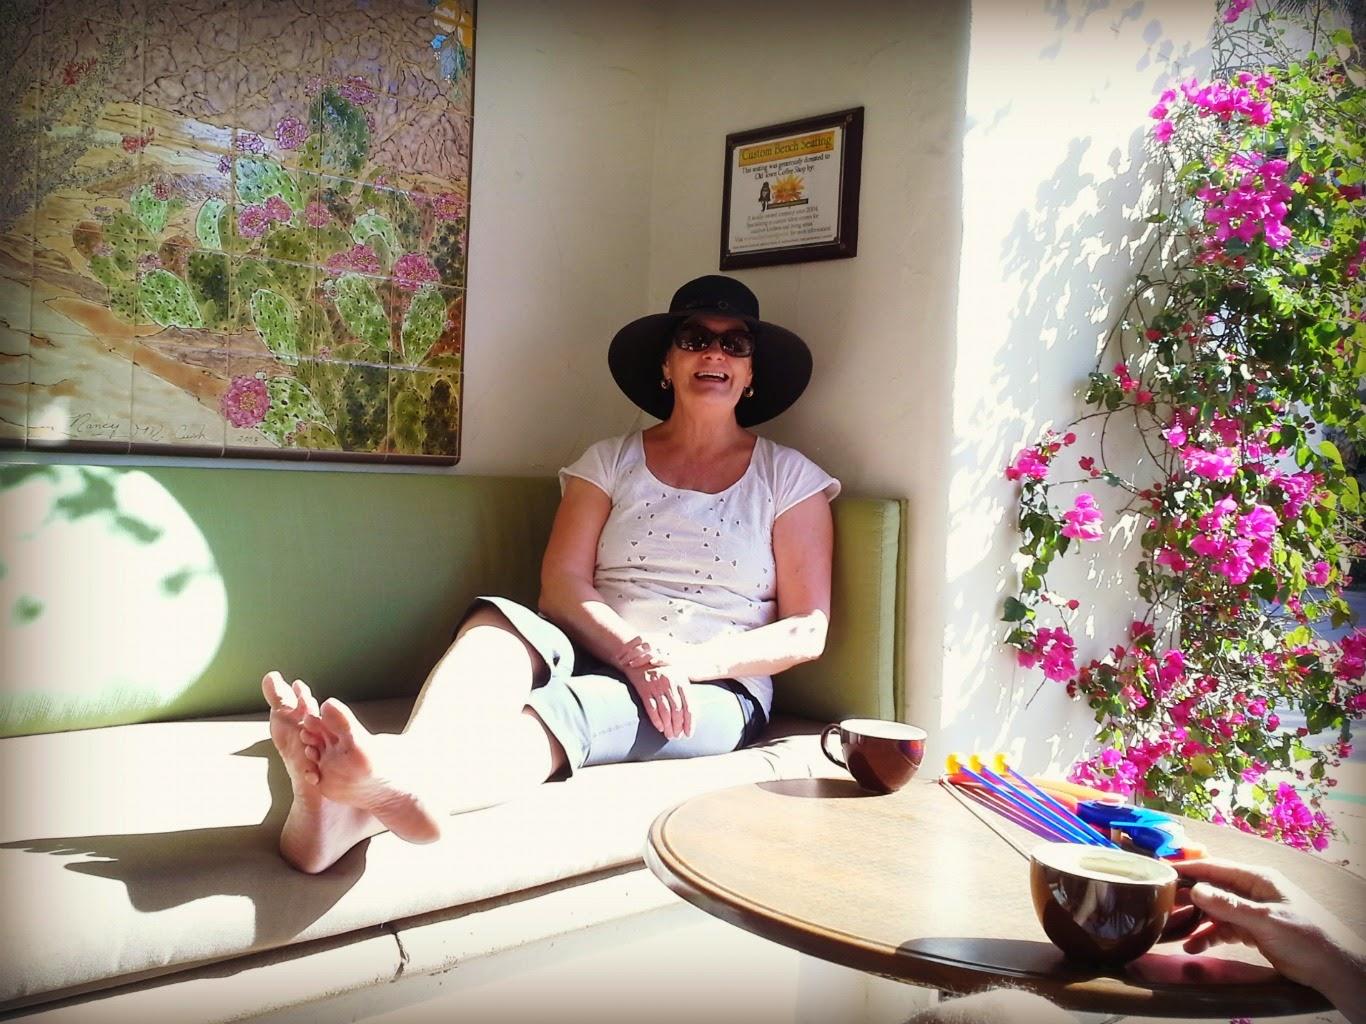 Lizzie Lau Mom Gammy Grandmother Old Town Coffee La Quinta